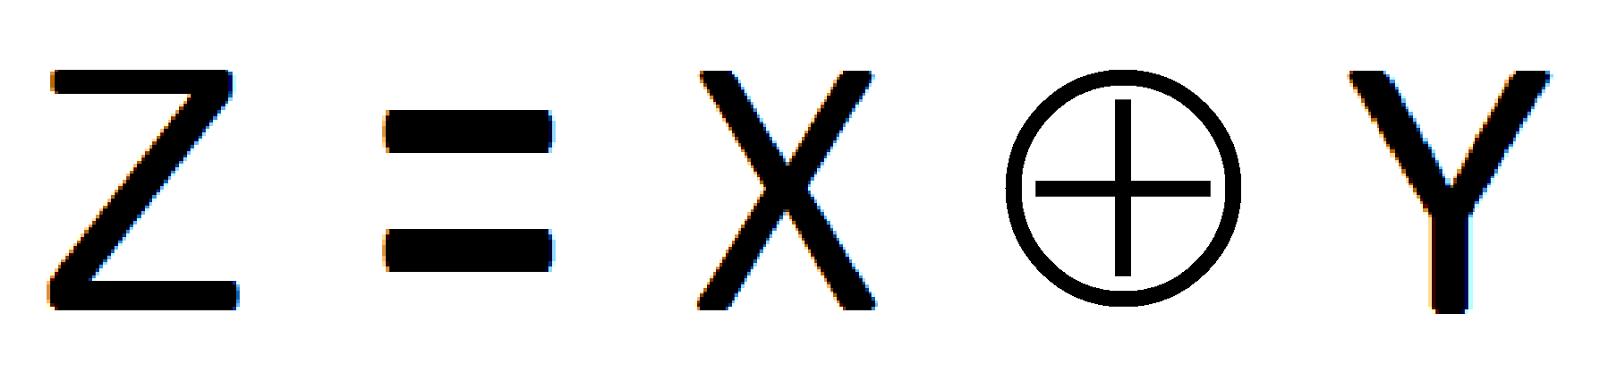 xor logic gate symbol